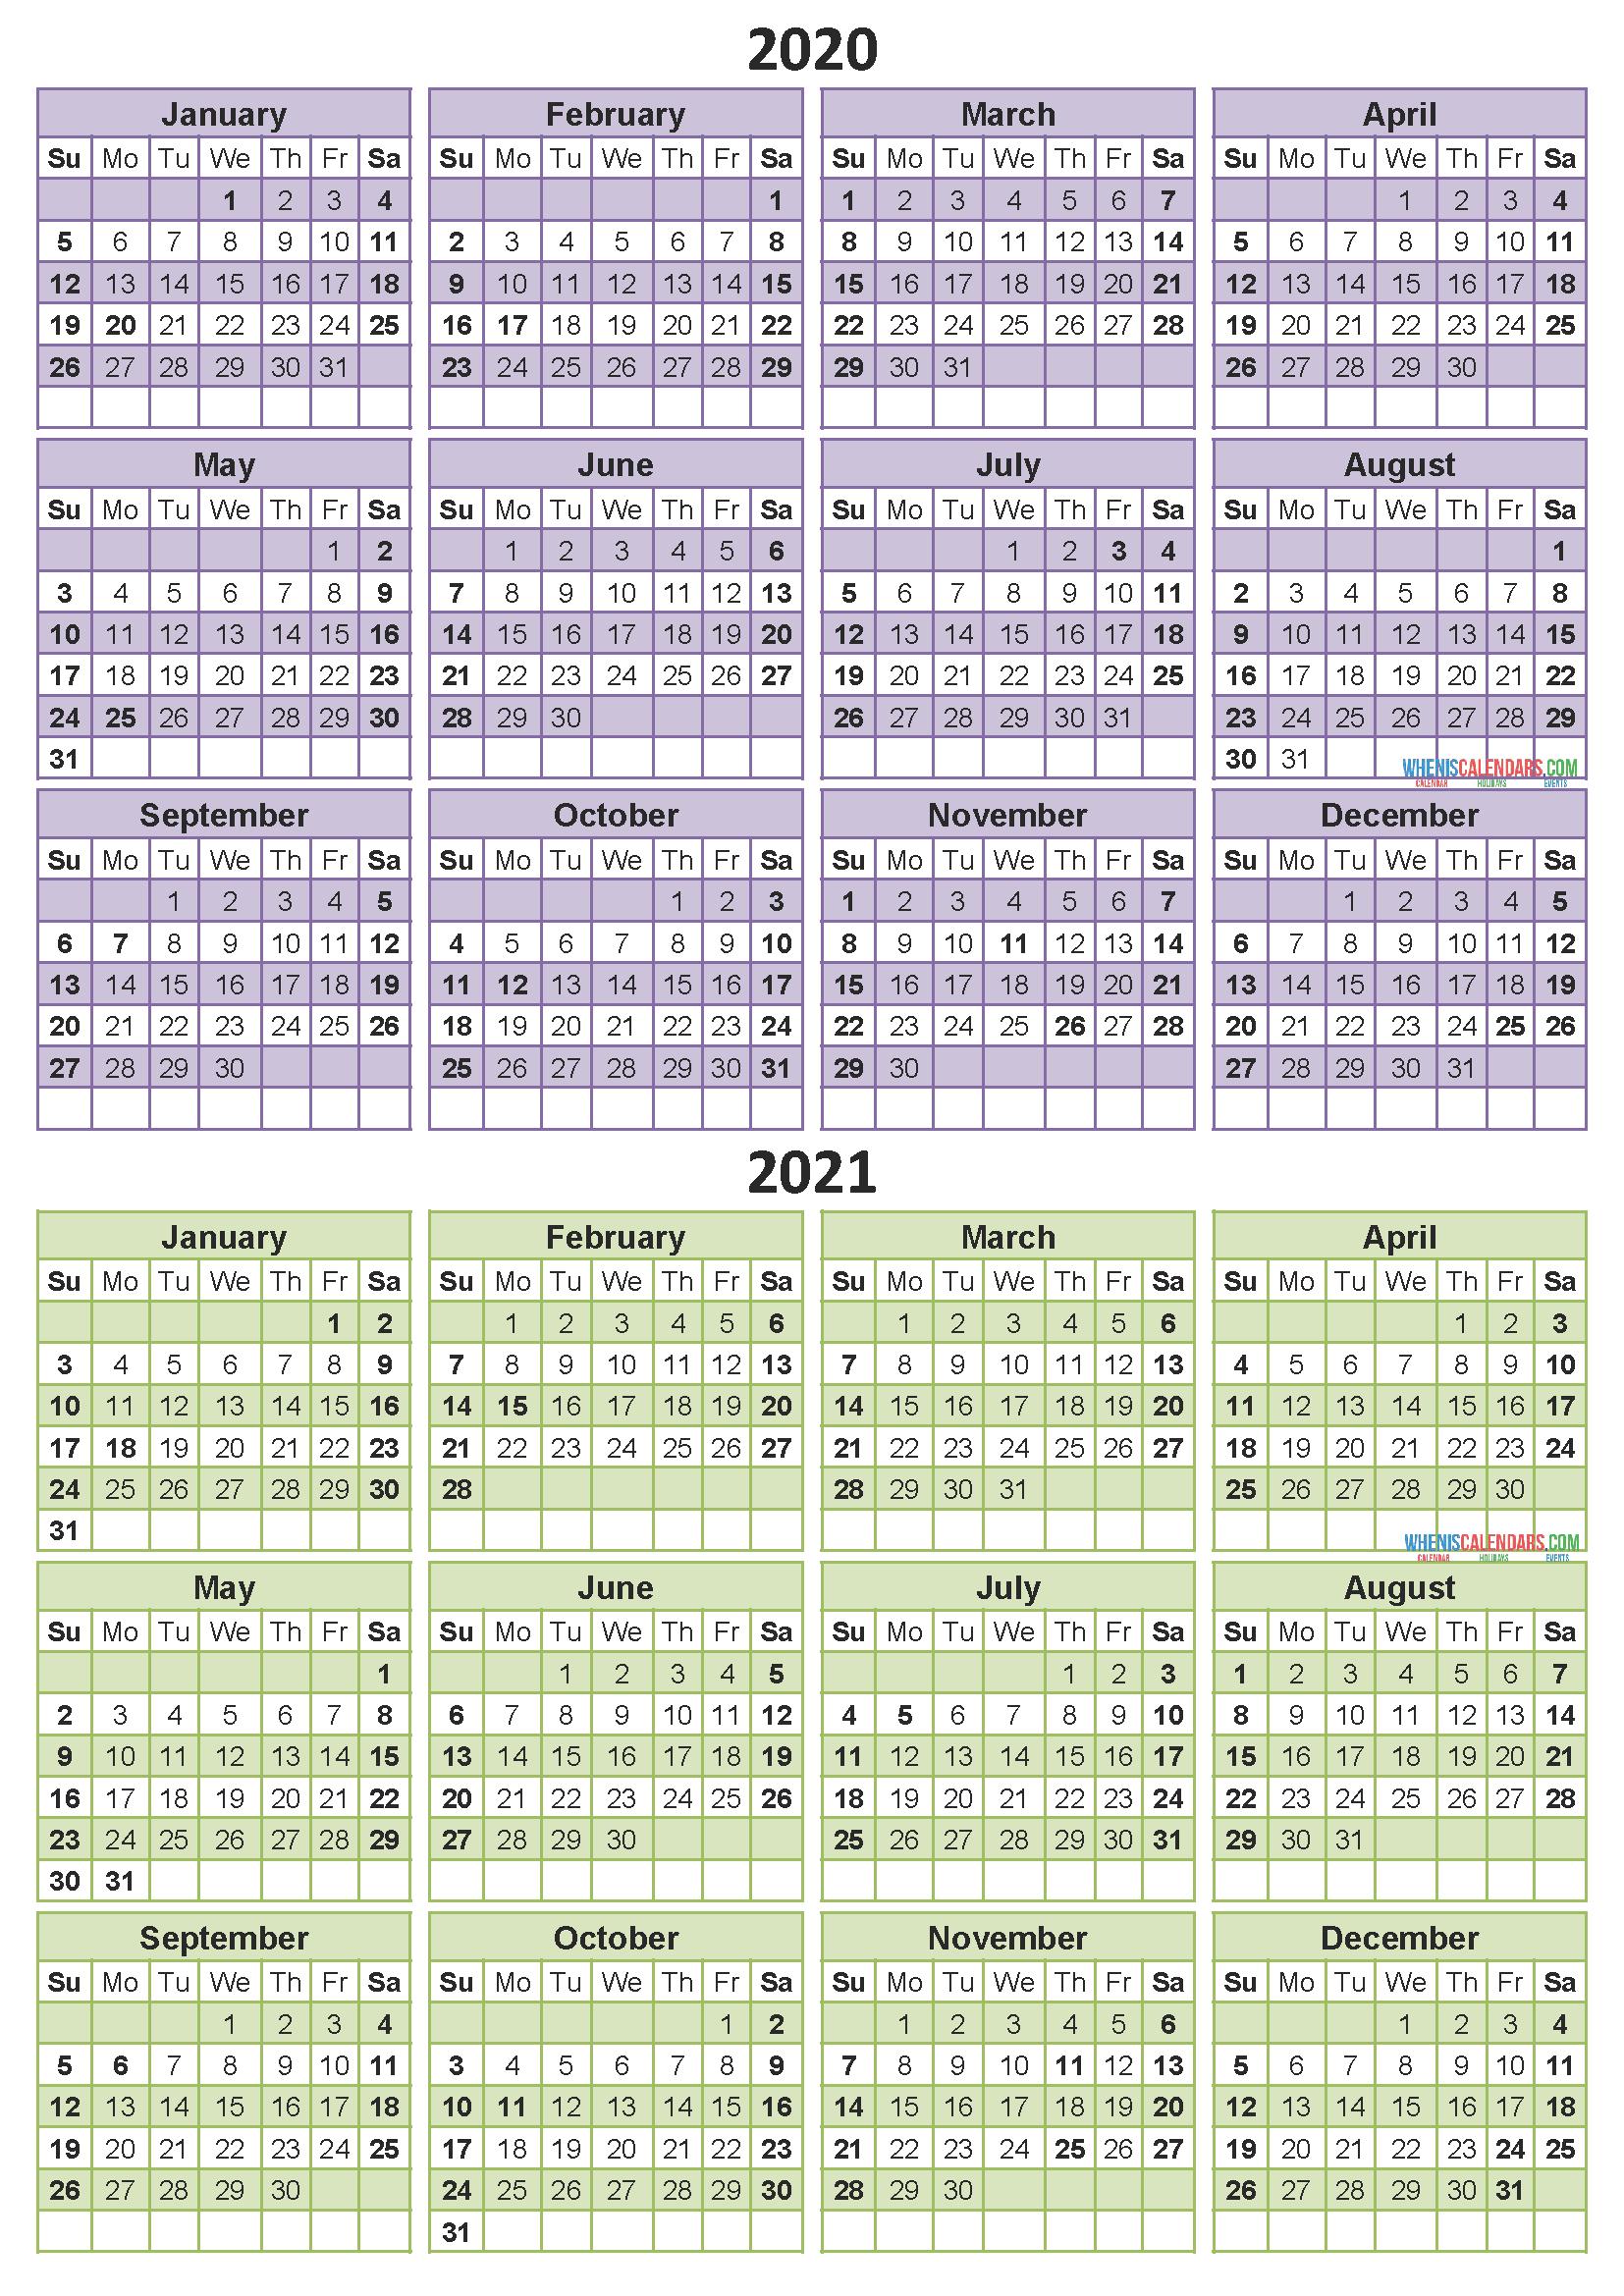 2 Year Calendar Printable 2020 2021 Word, PDF, Image ...